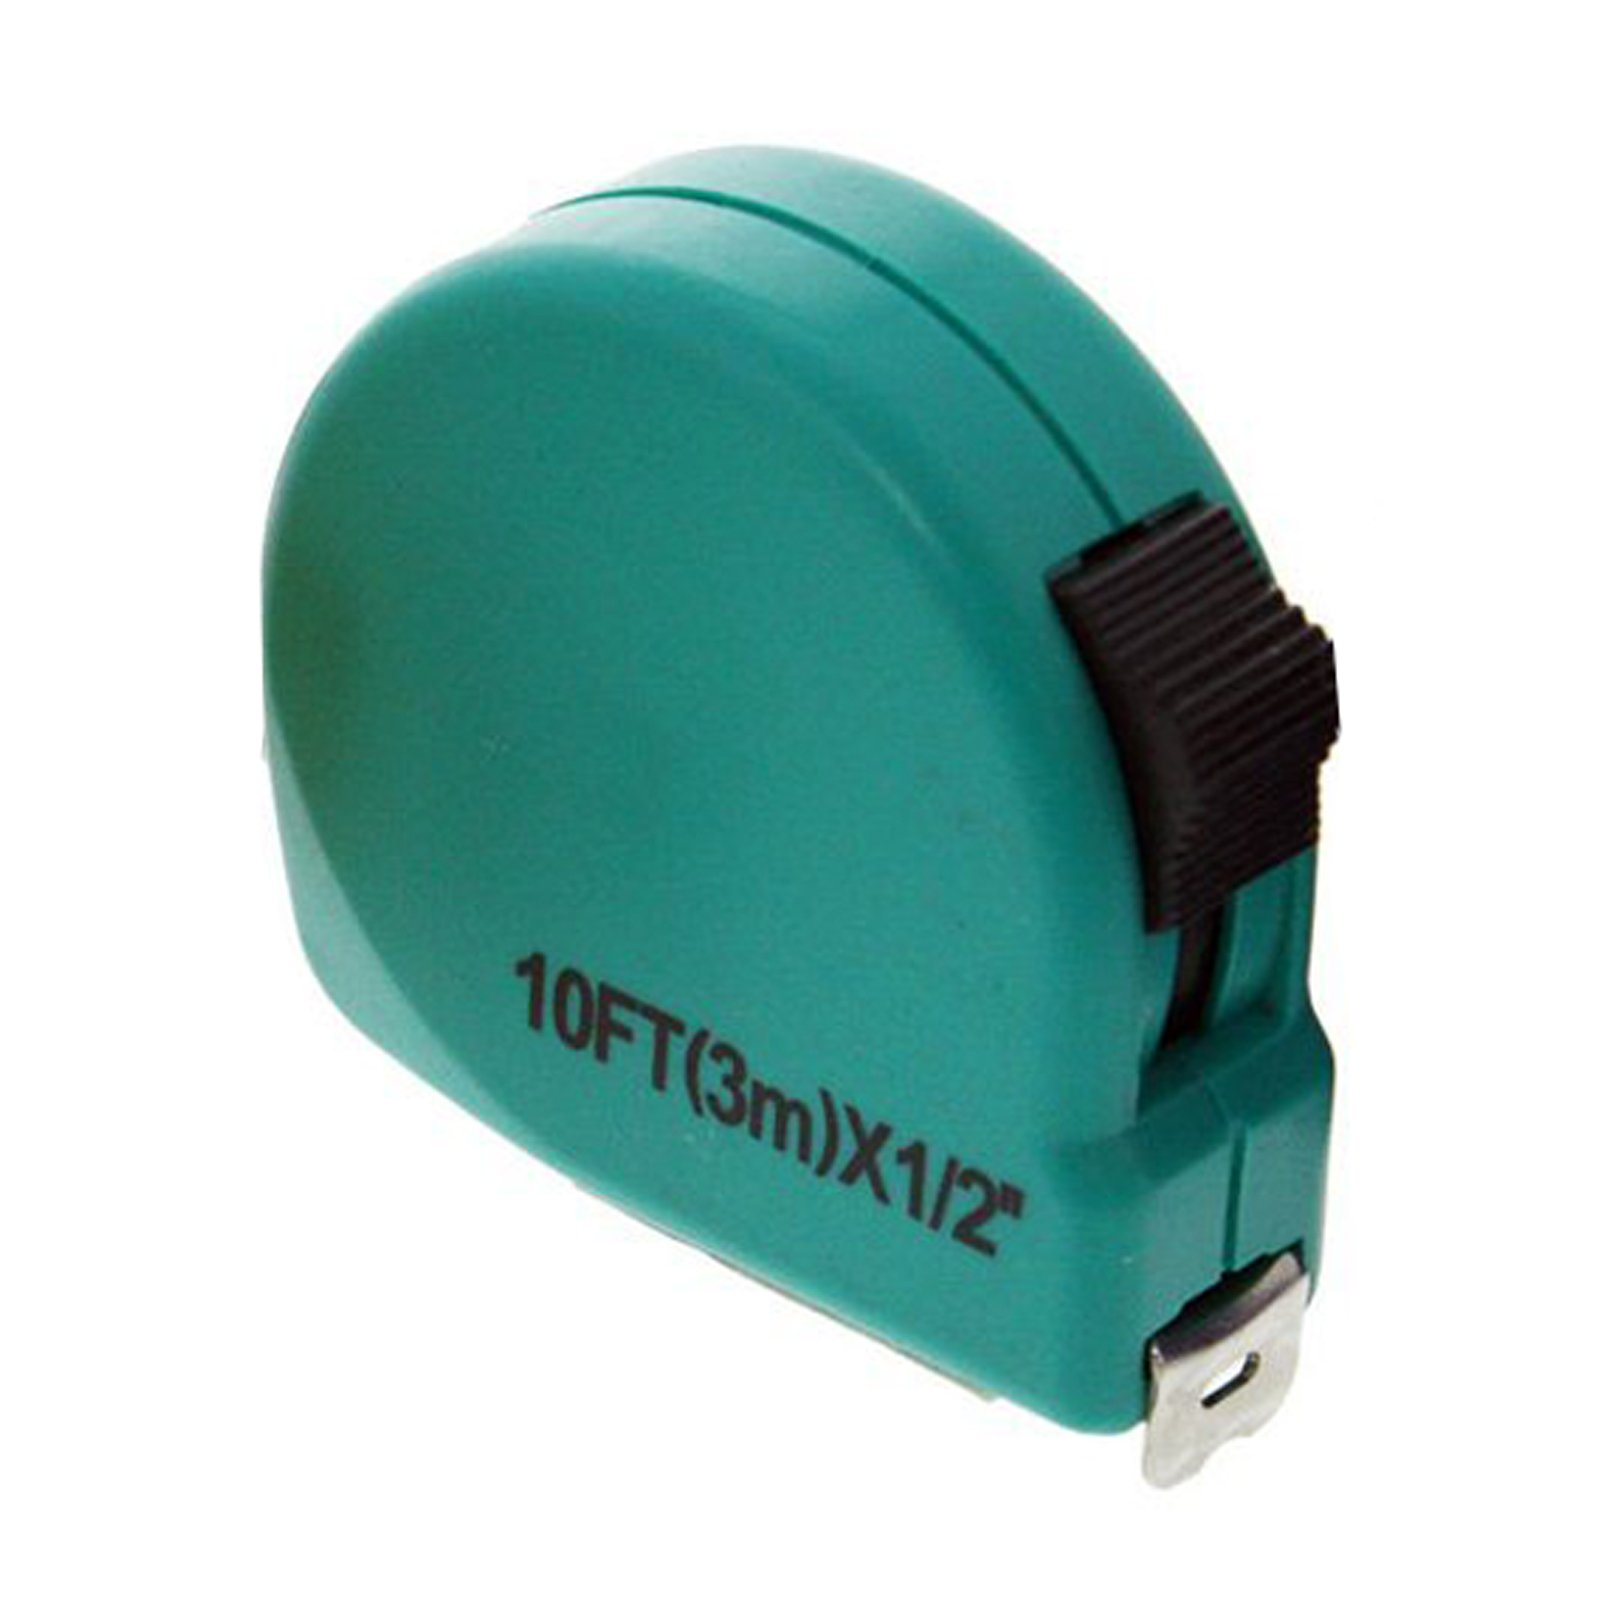 Universal Tool 10ft Measuring Tape Metric SAE 3 Meters Tape Measure - Teal